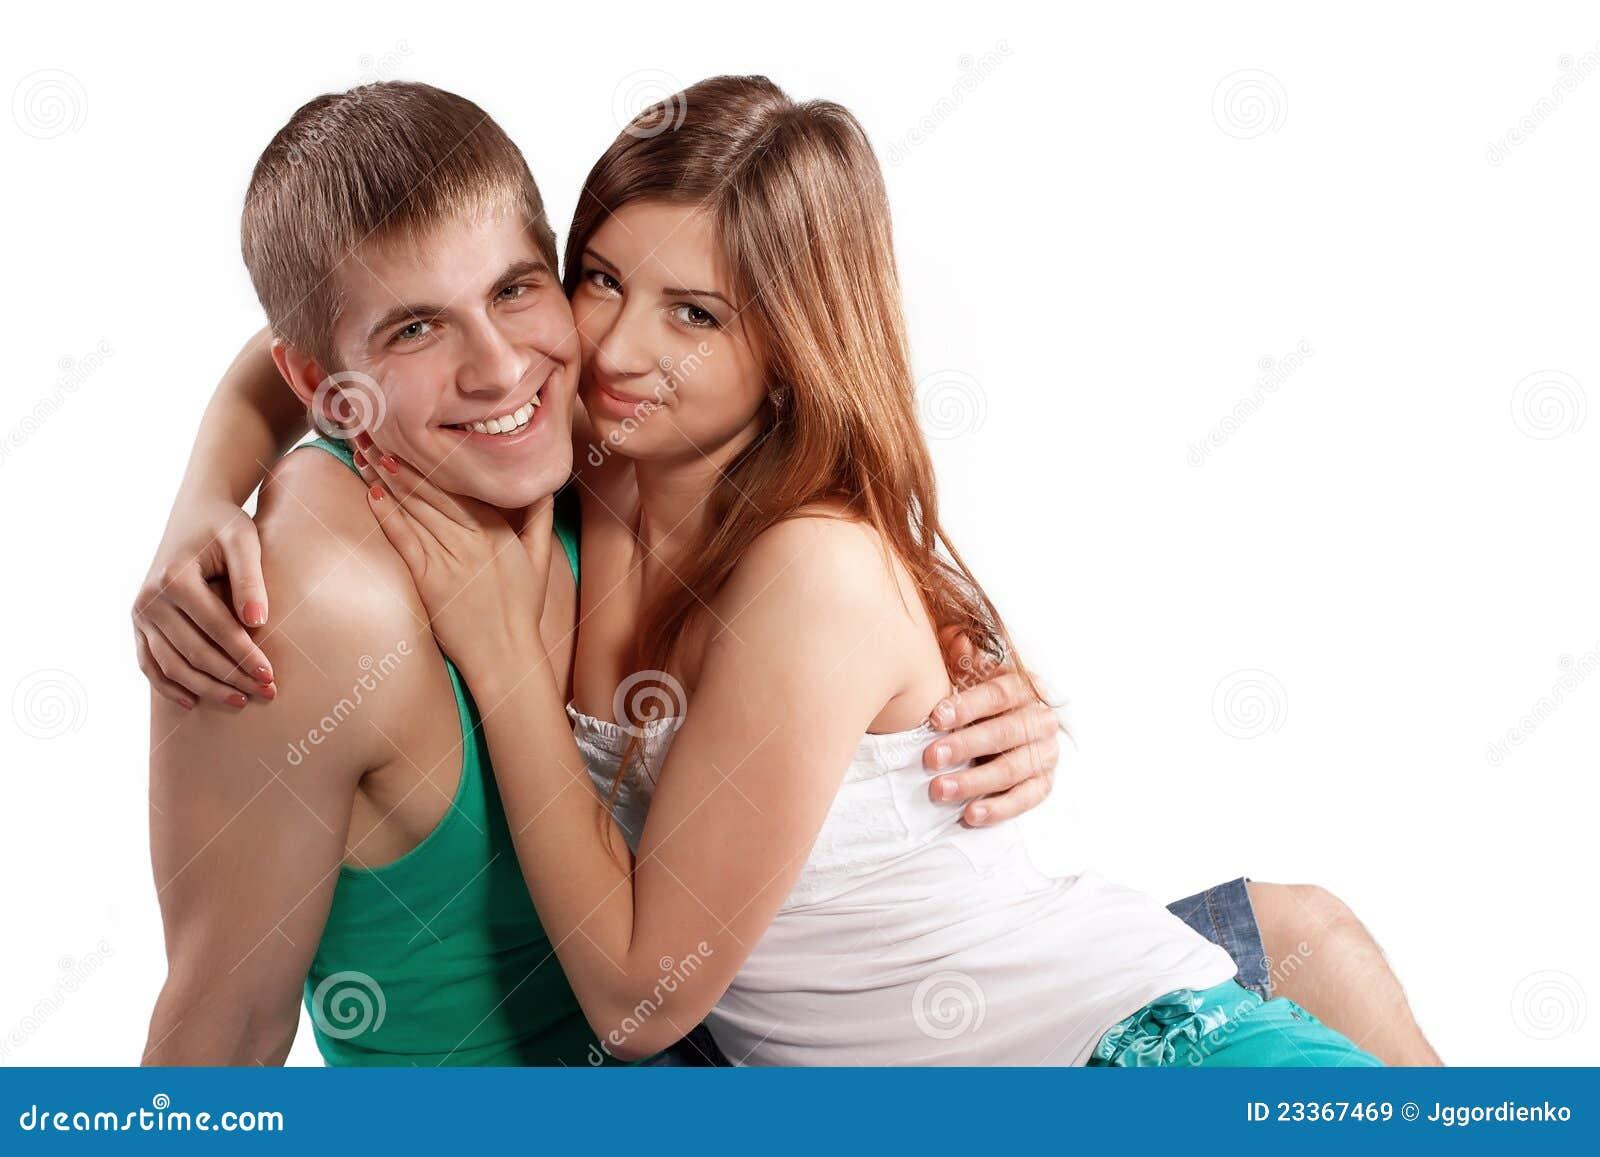 men and women relationship